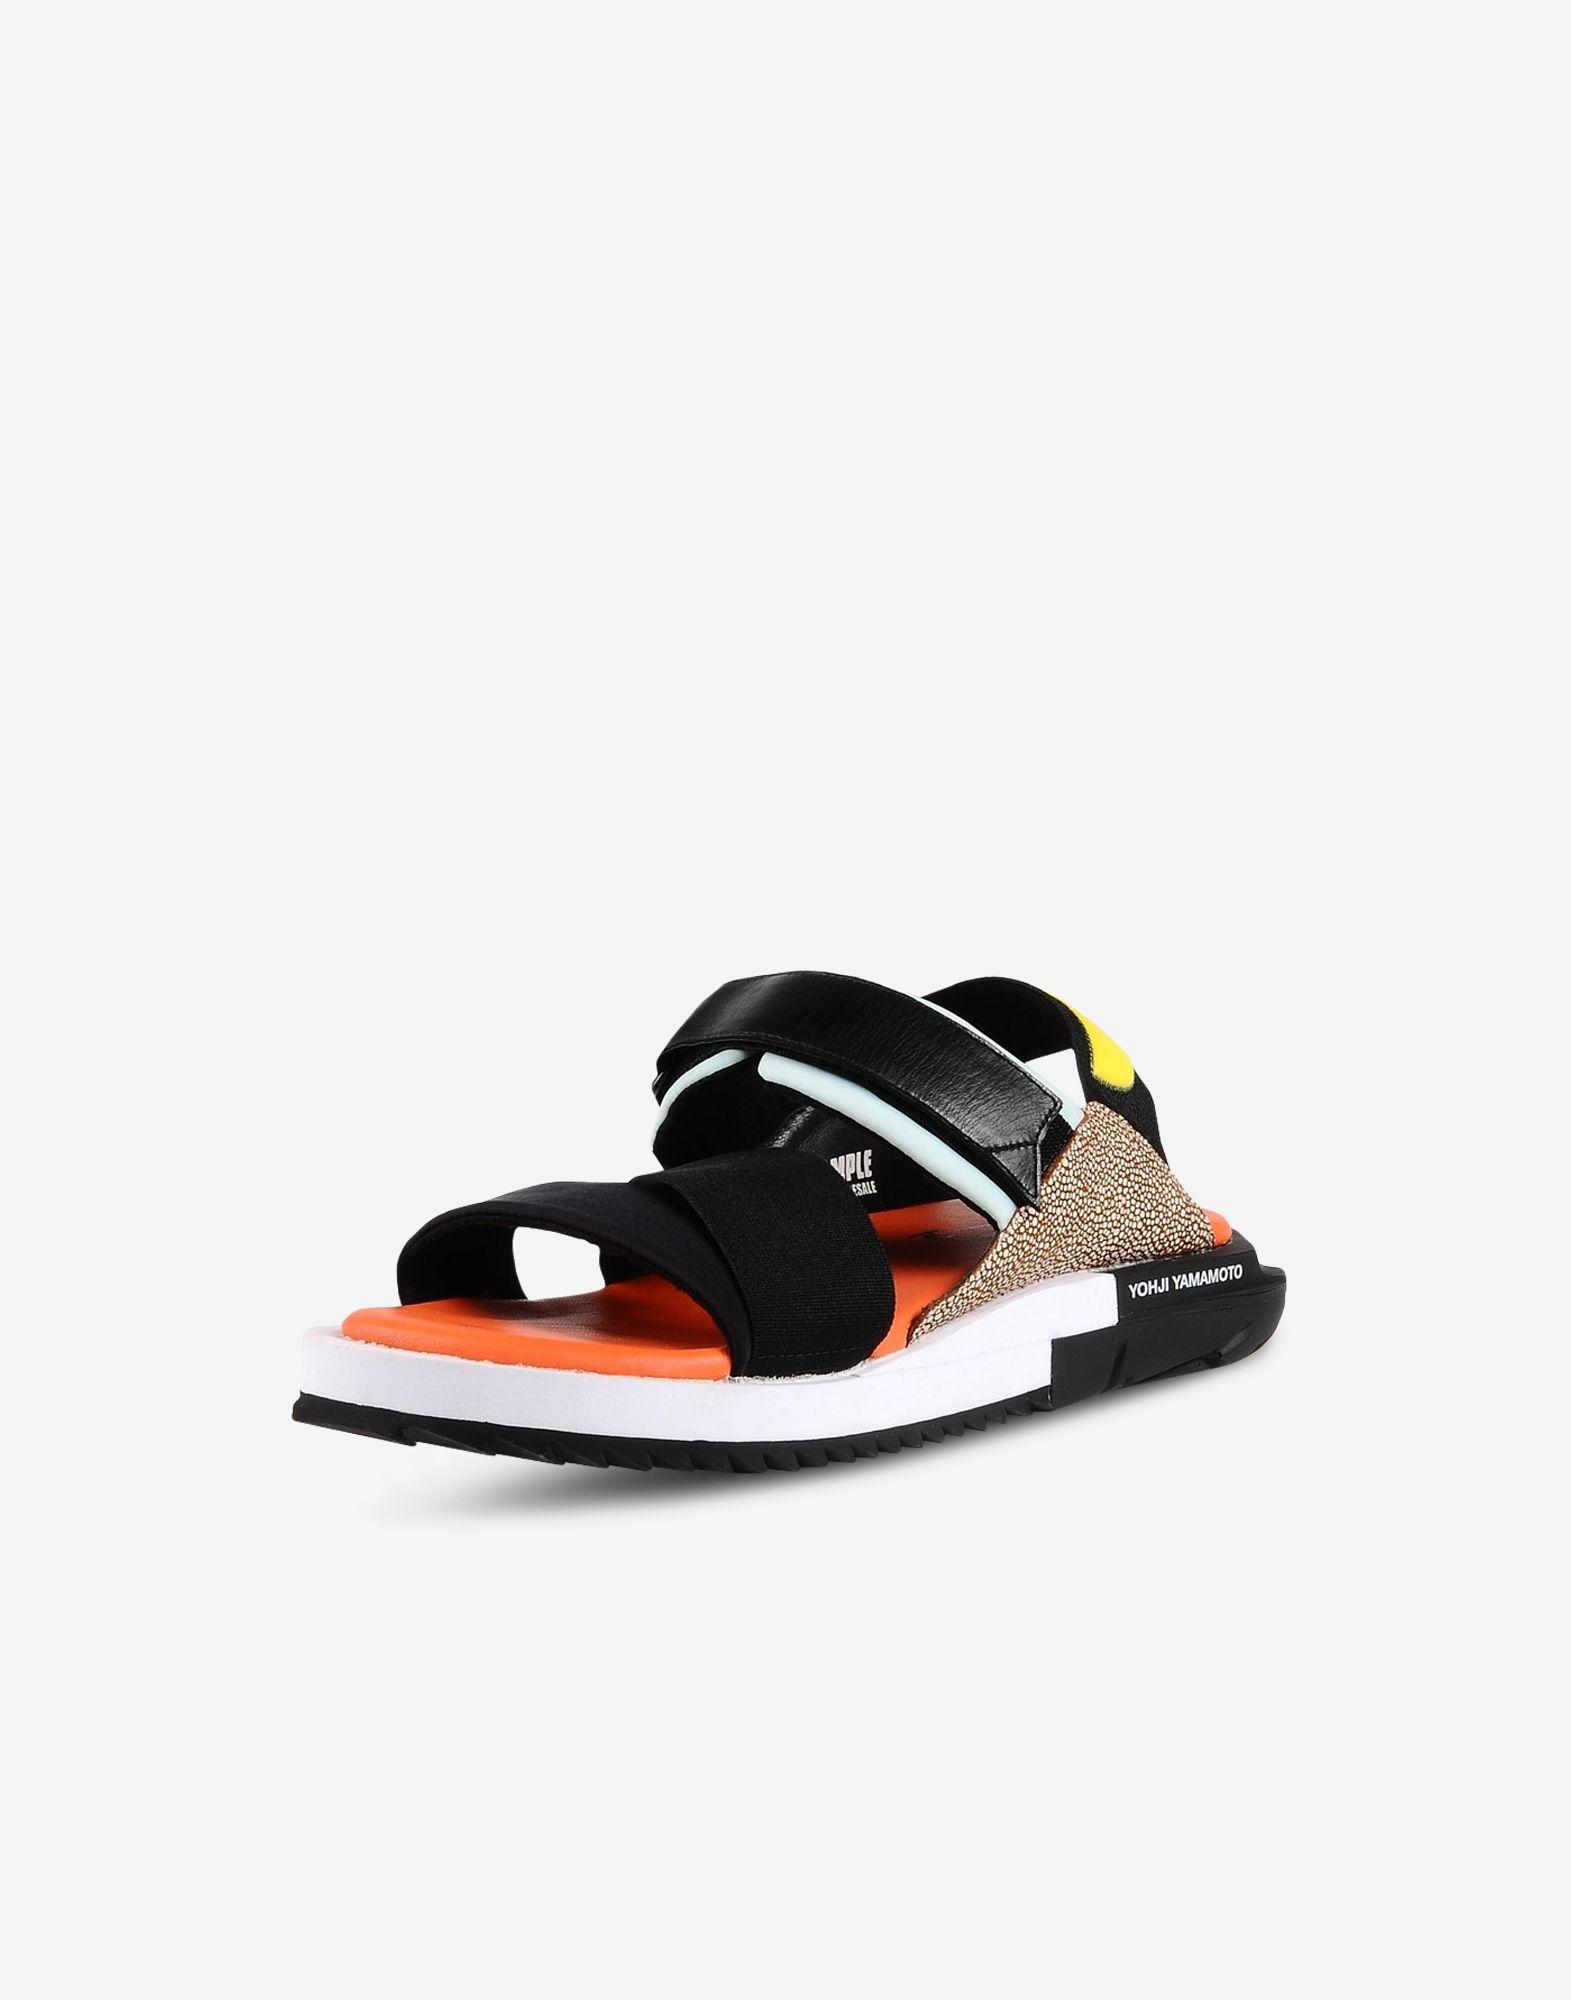 74b38def2 ... Y-3 Y-3 Kaohe Sandal Sandals Man ...